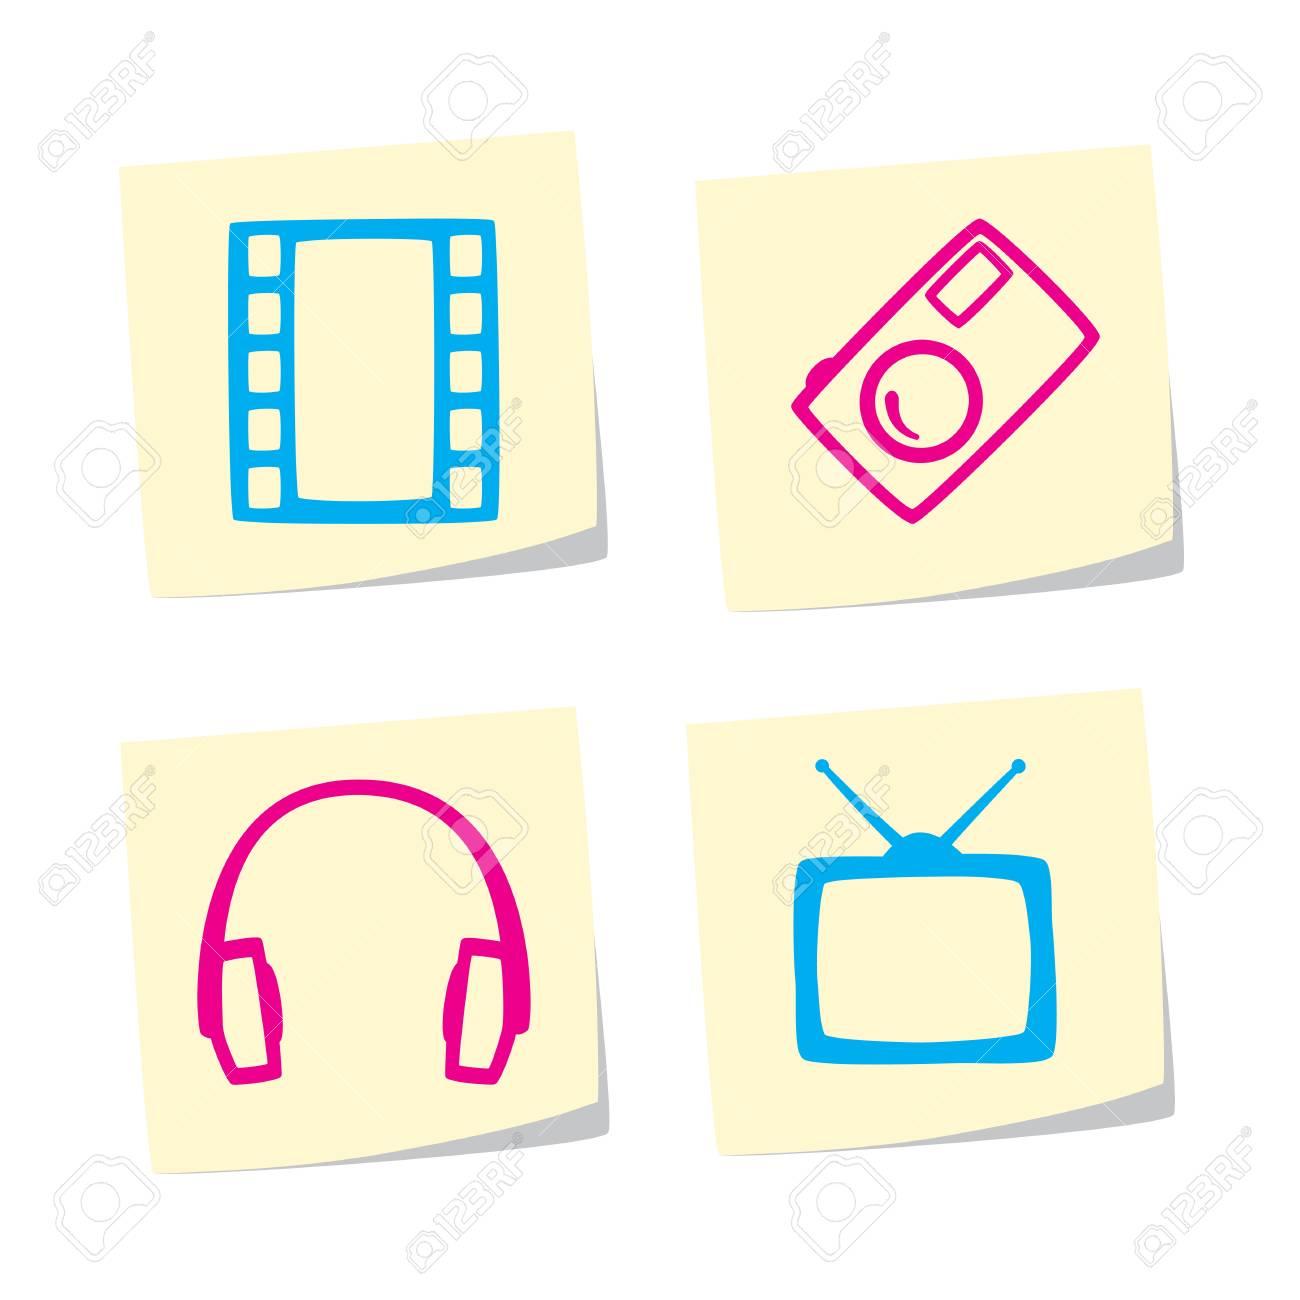 Media Icons Stock Vector - 9402336